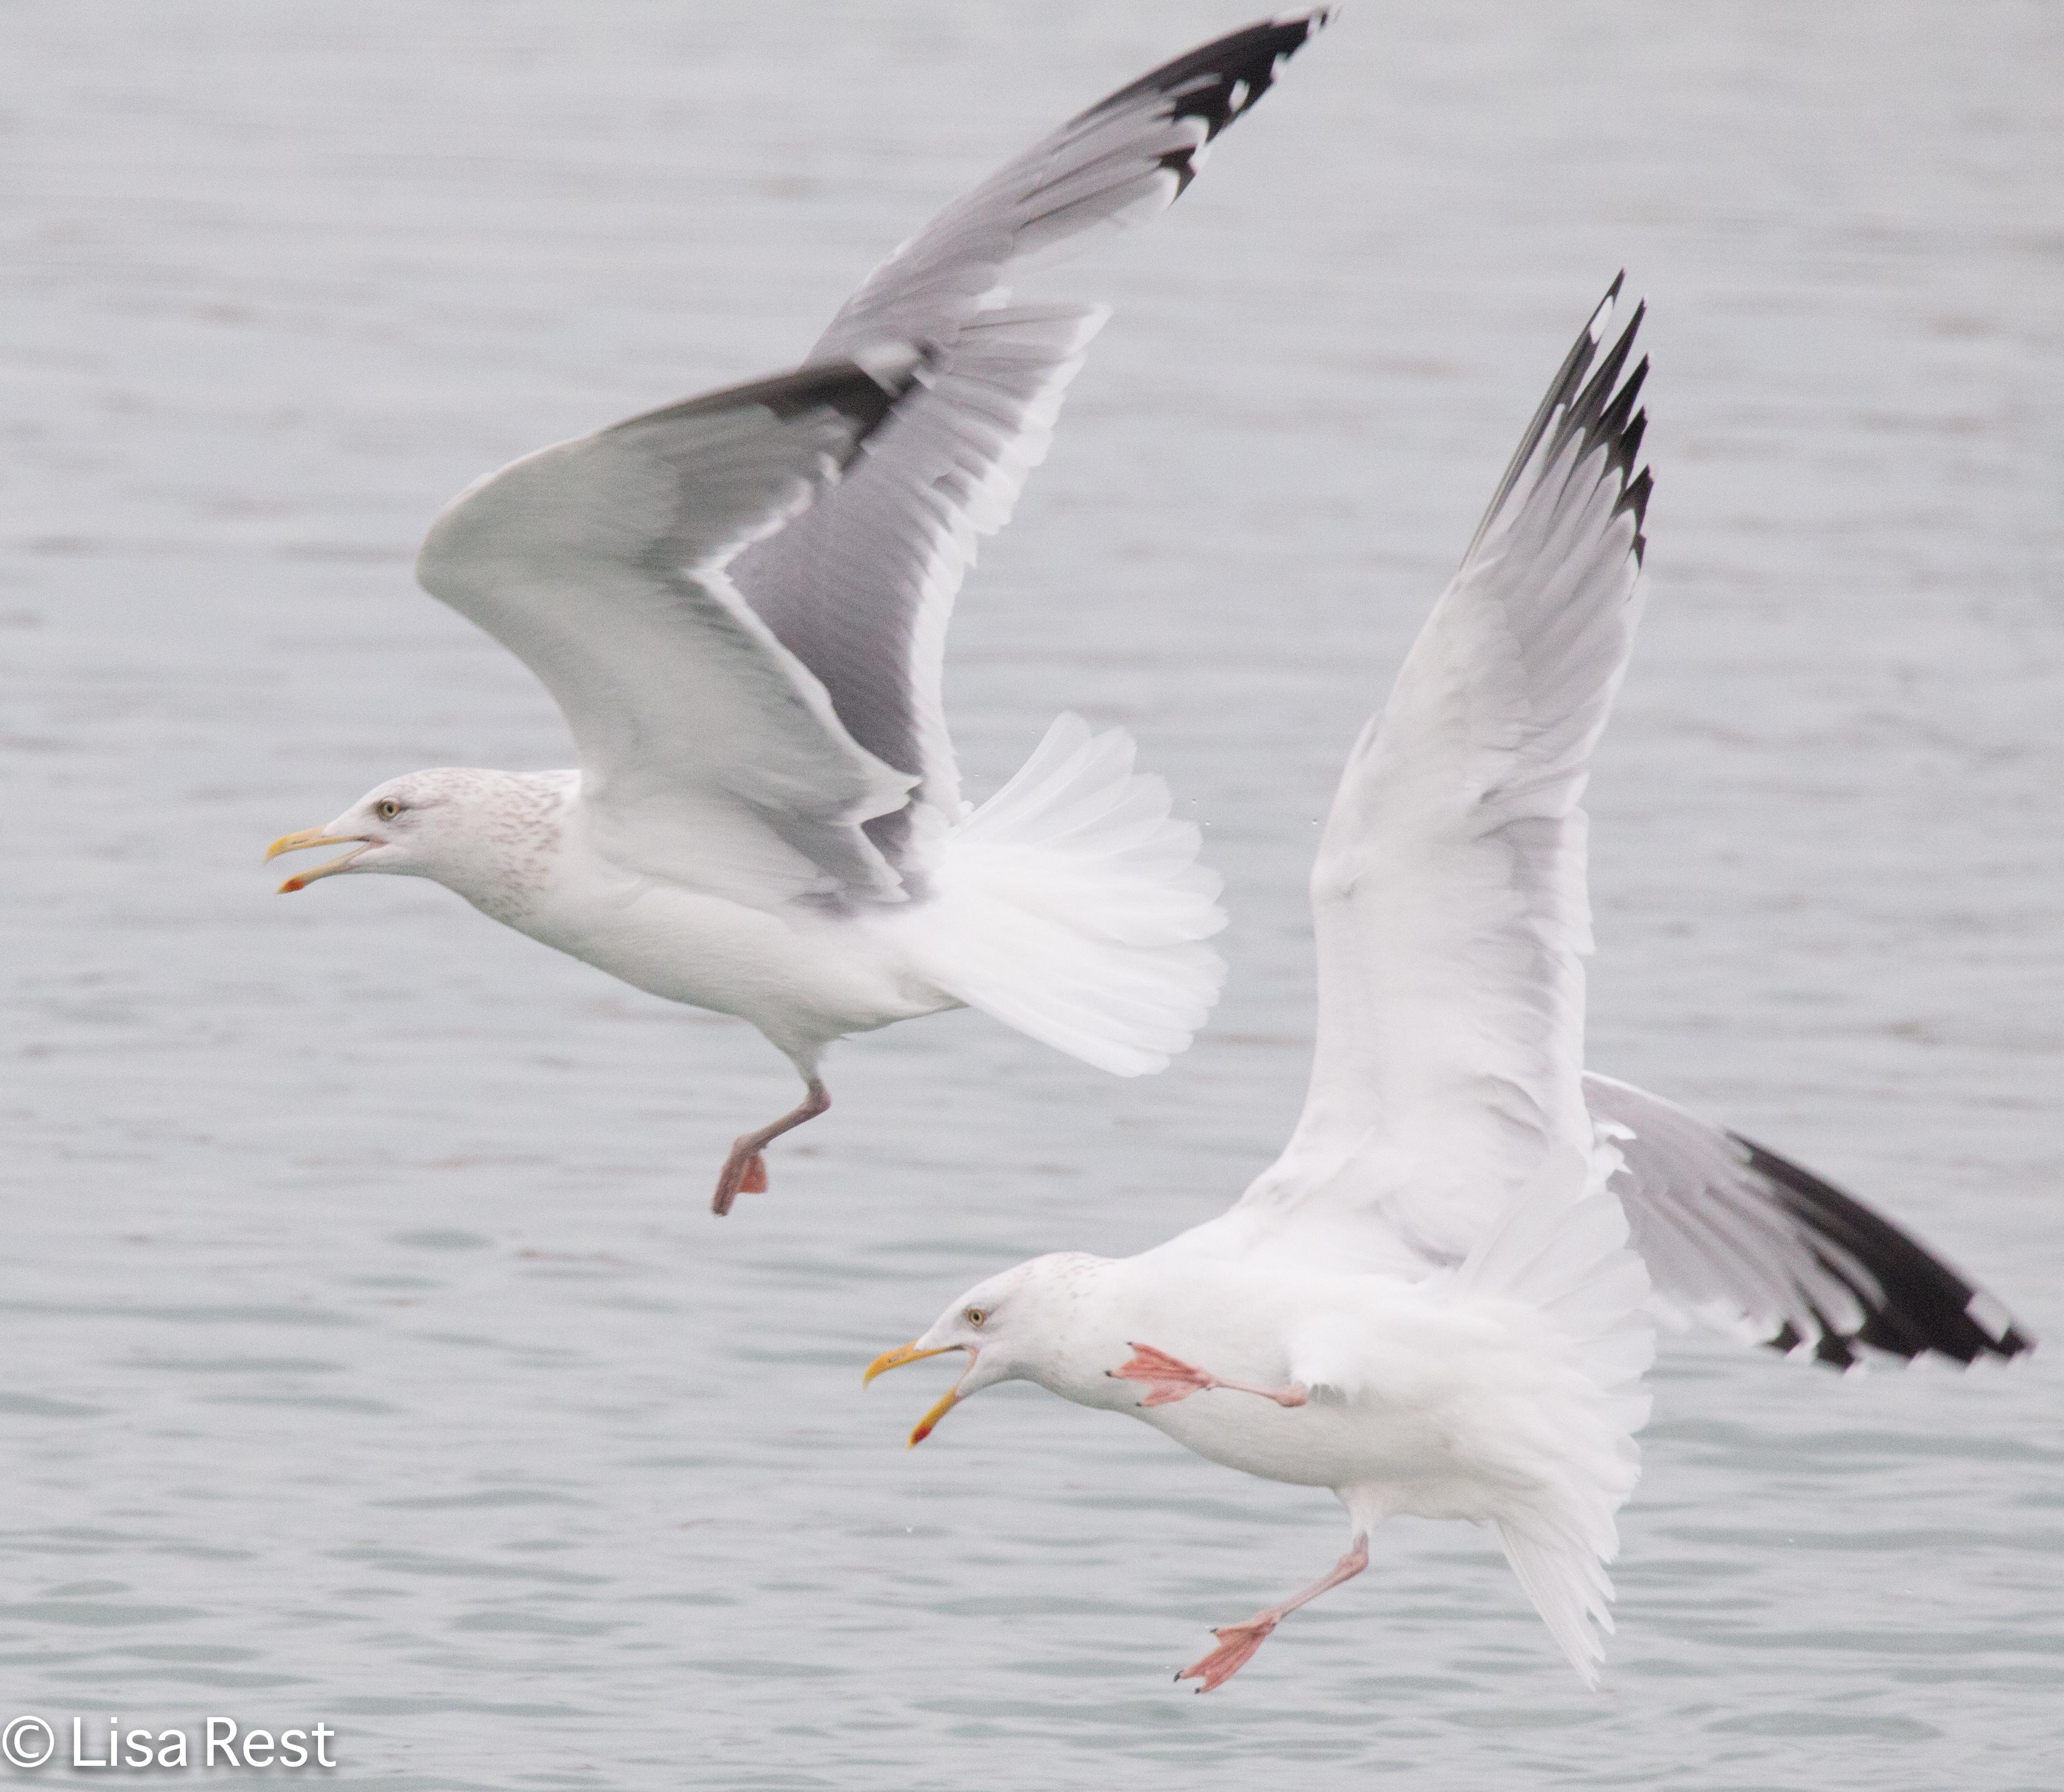 hegu-gull-frolic-2-11-17-8634